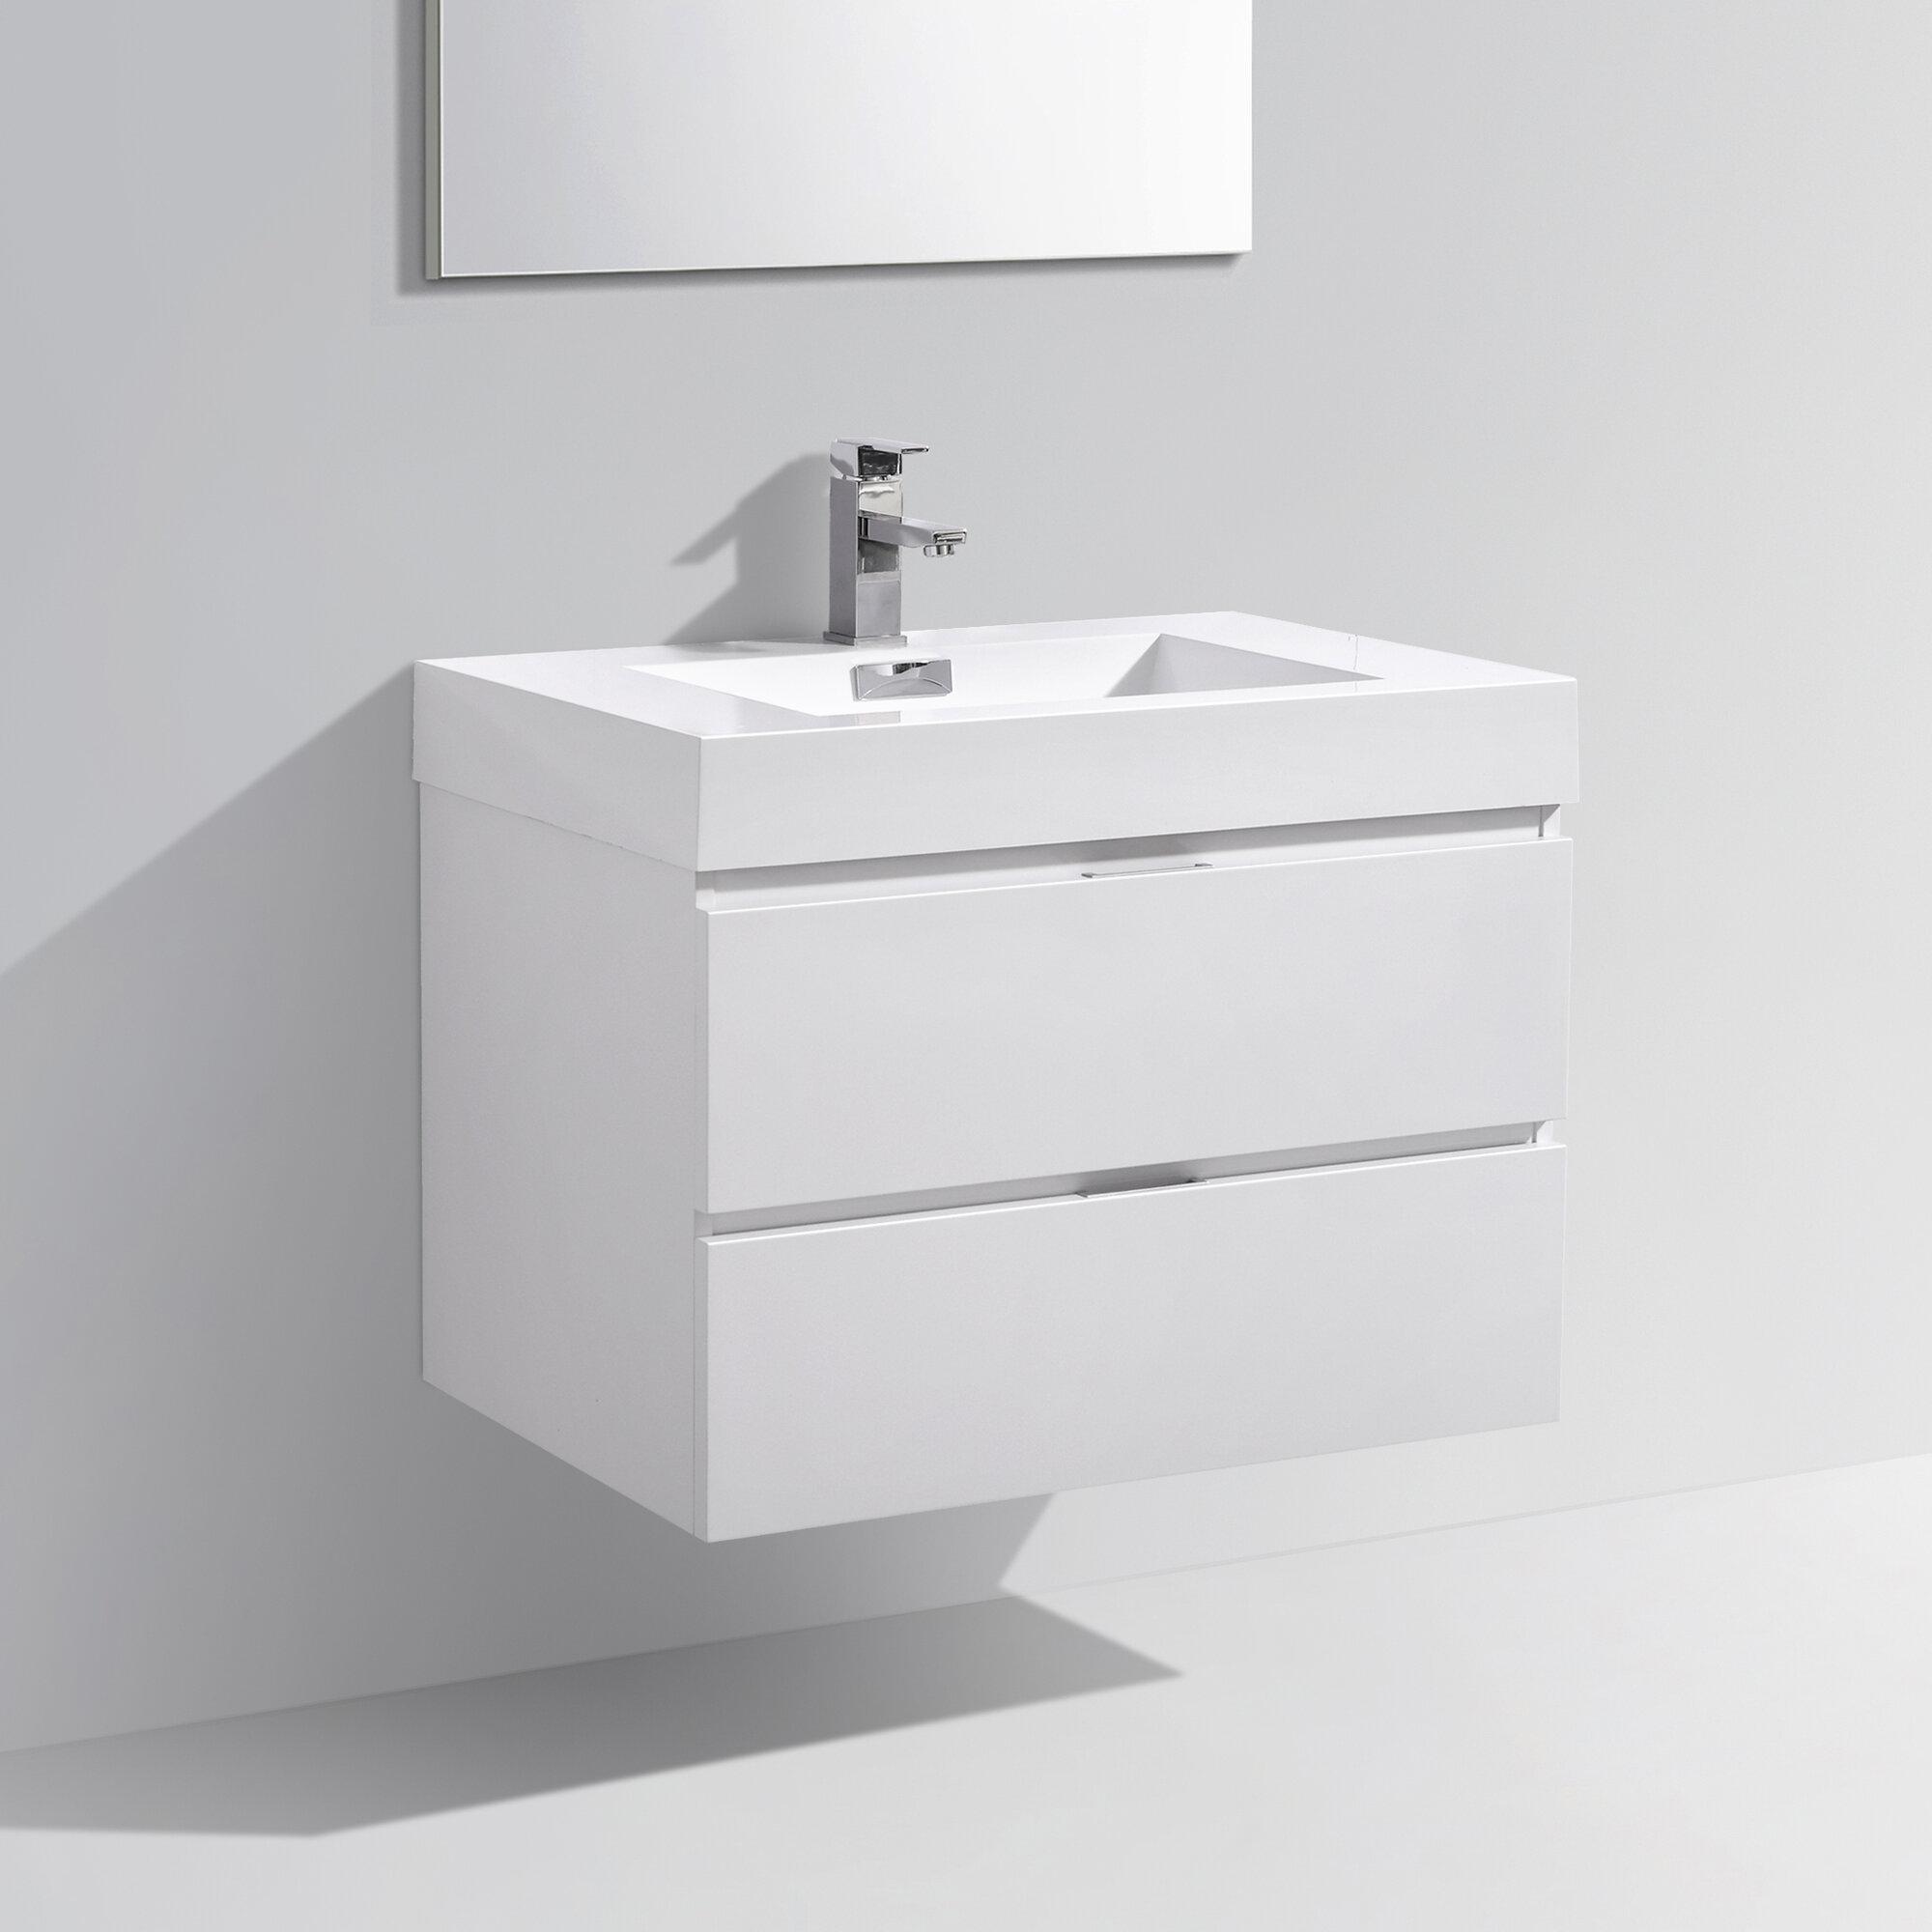 Kube Bath Bliss 30 Single Wall Mount Modern Bathroom Vanity Set EBay